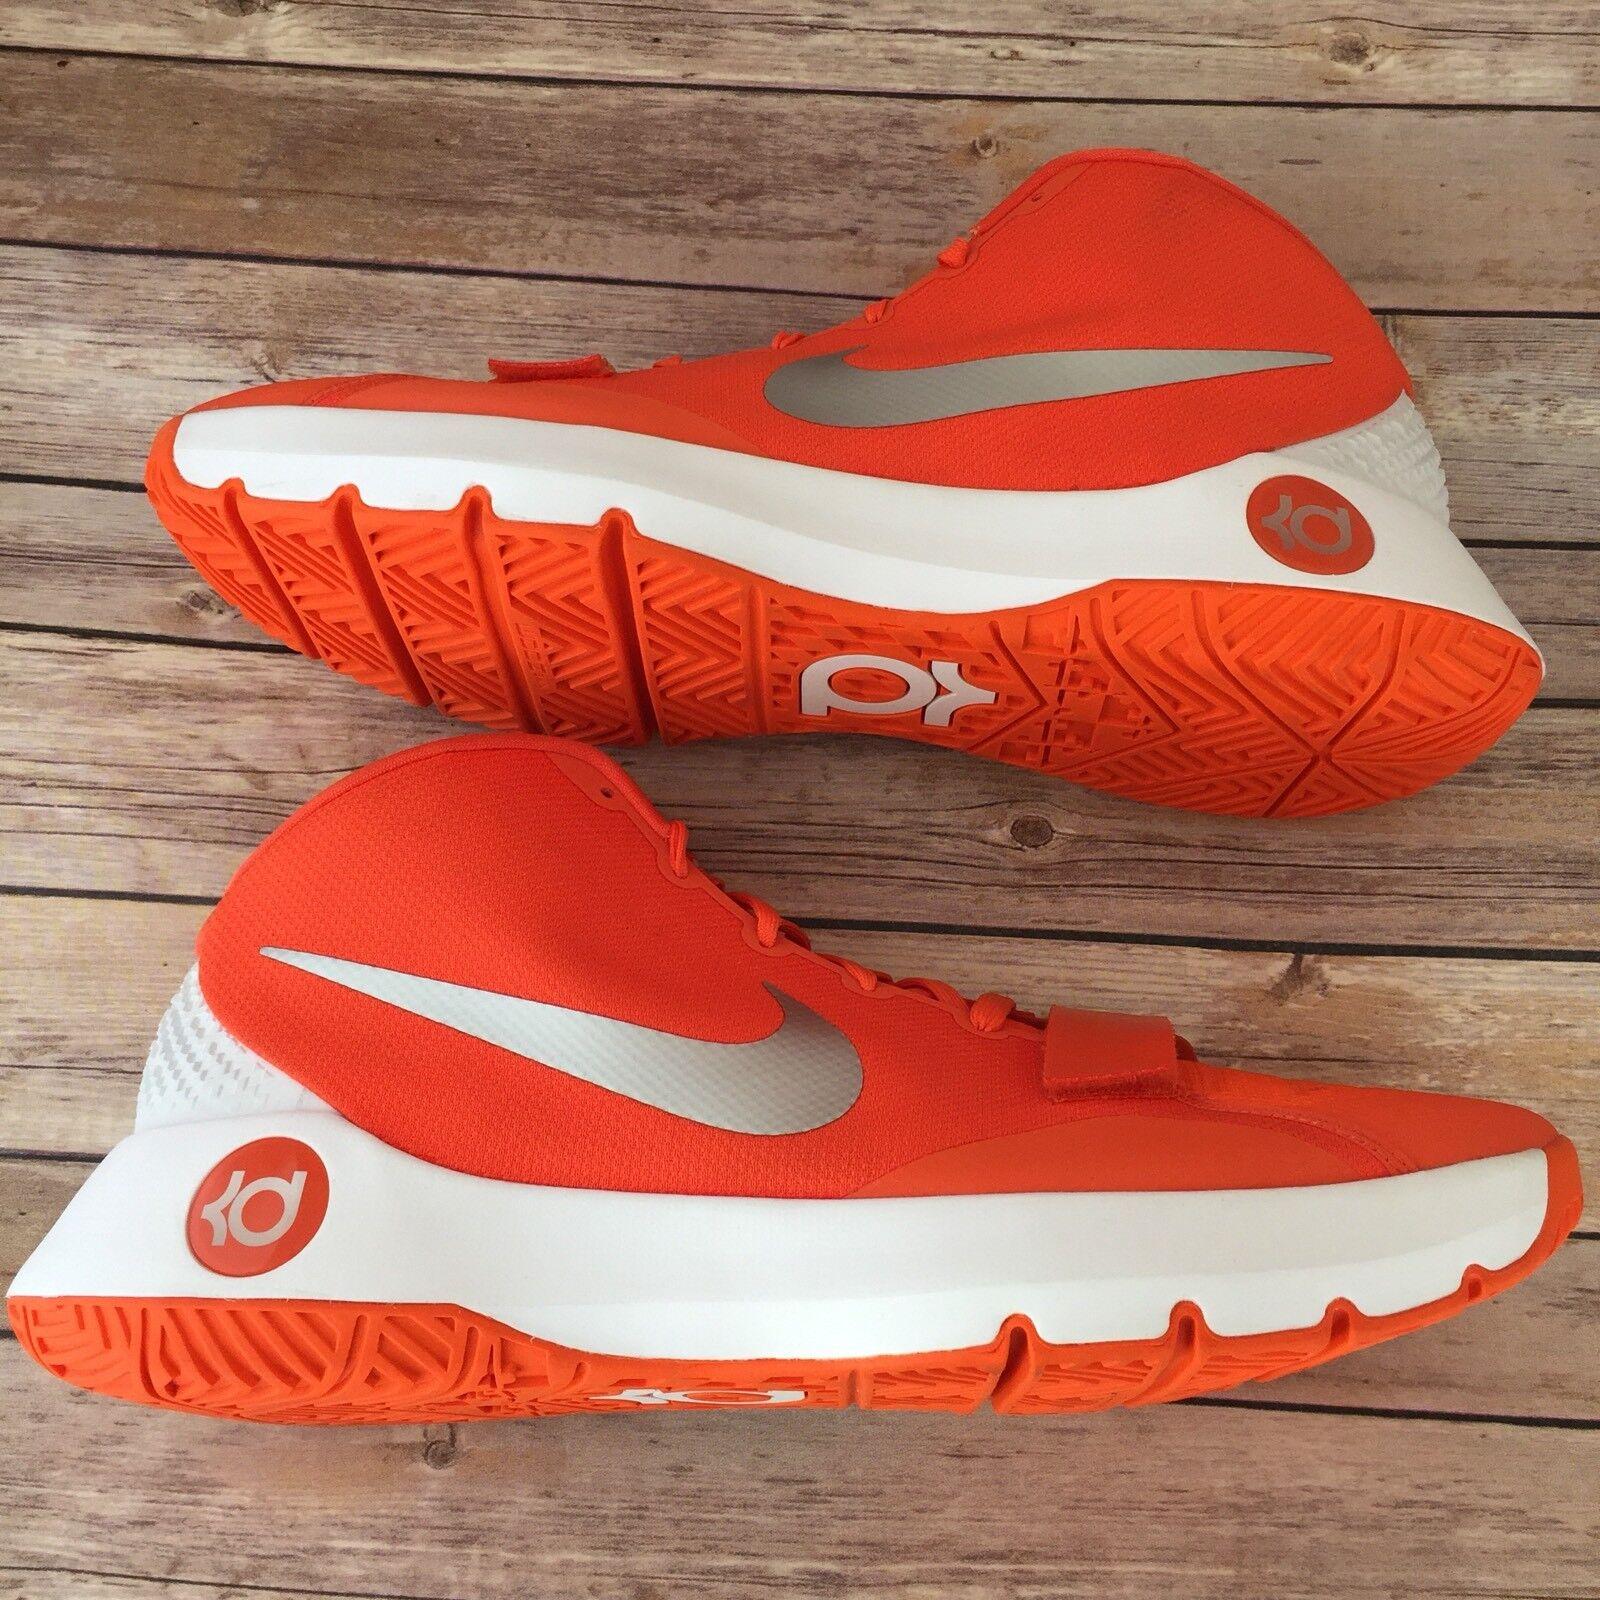 scarpe kd 5 uomo online